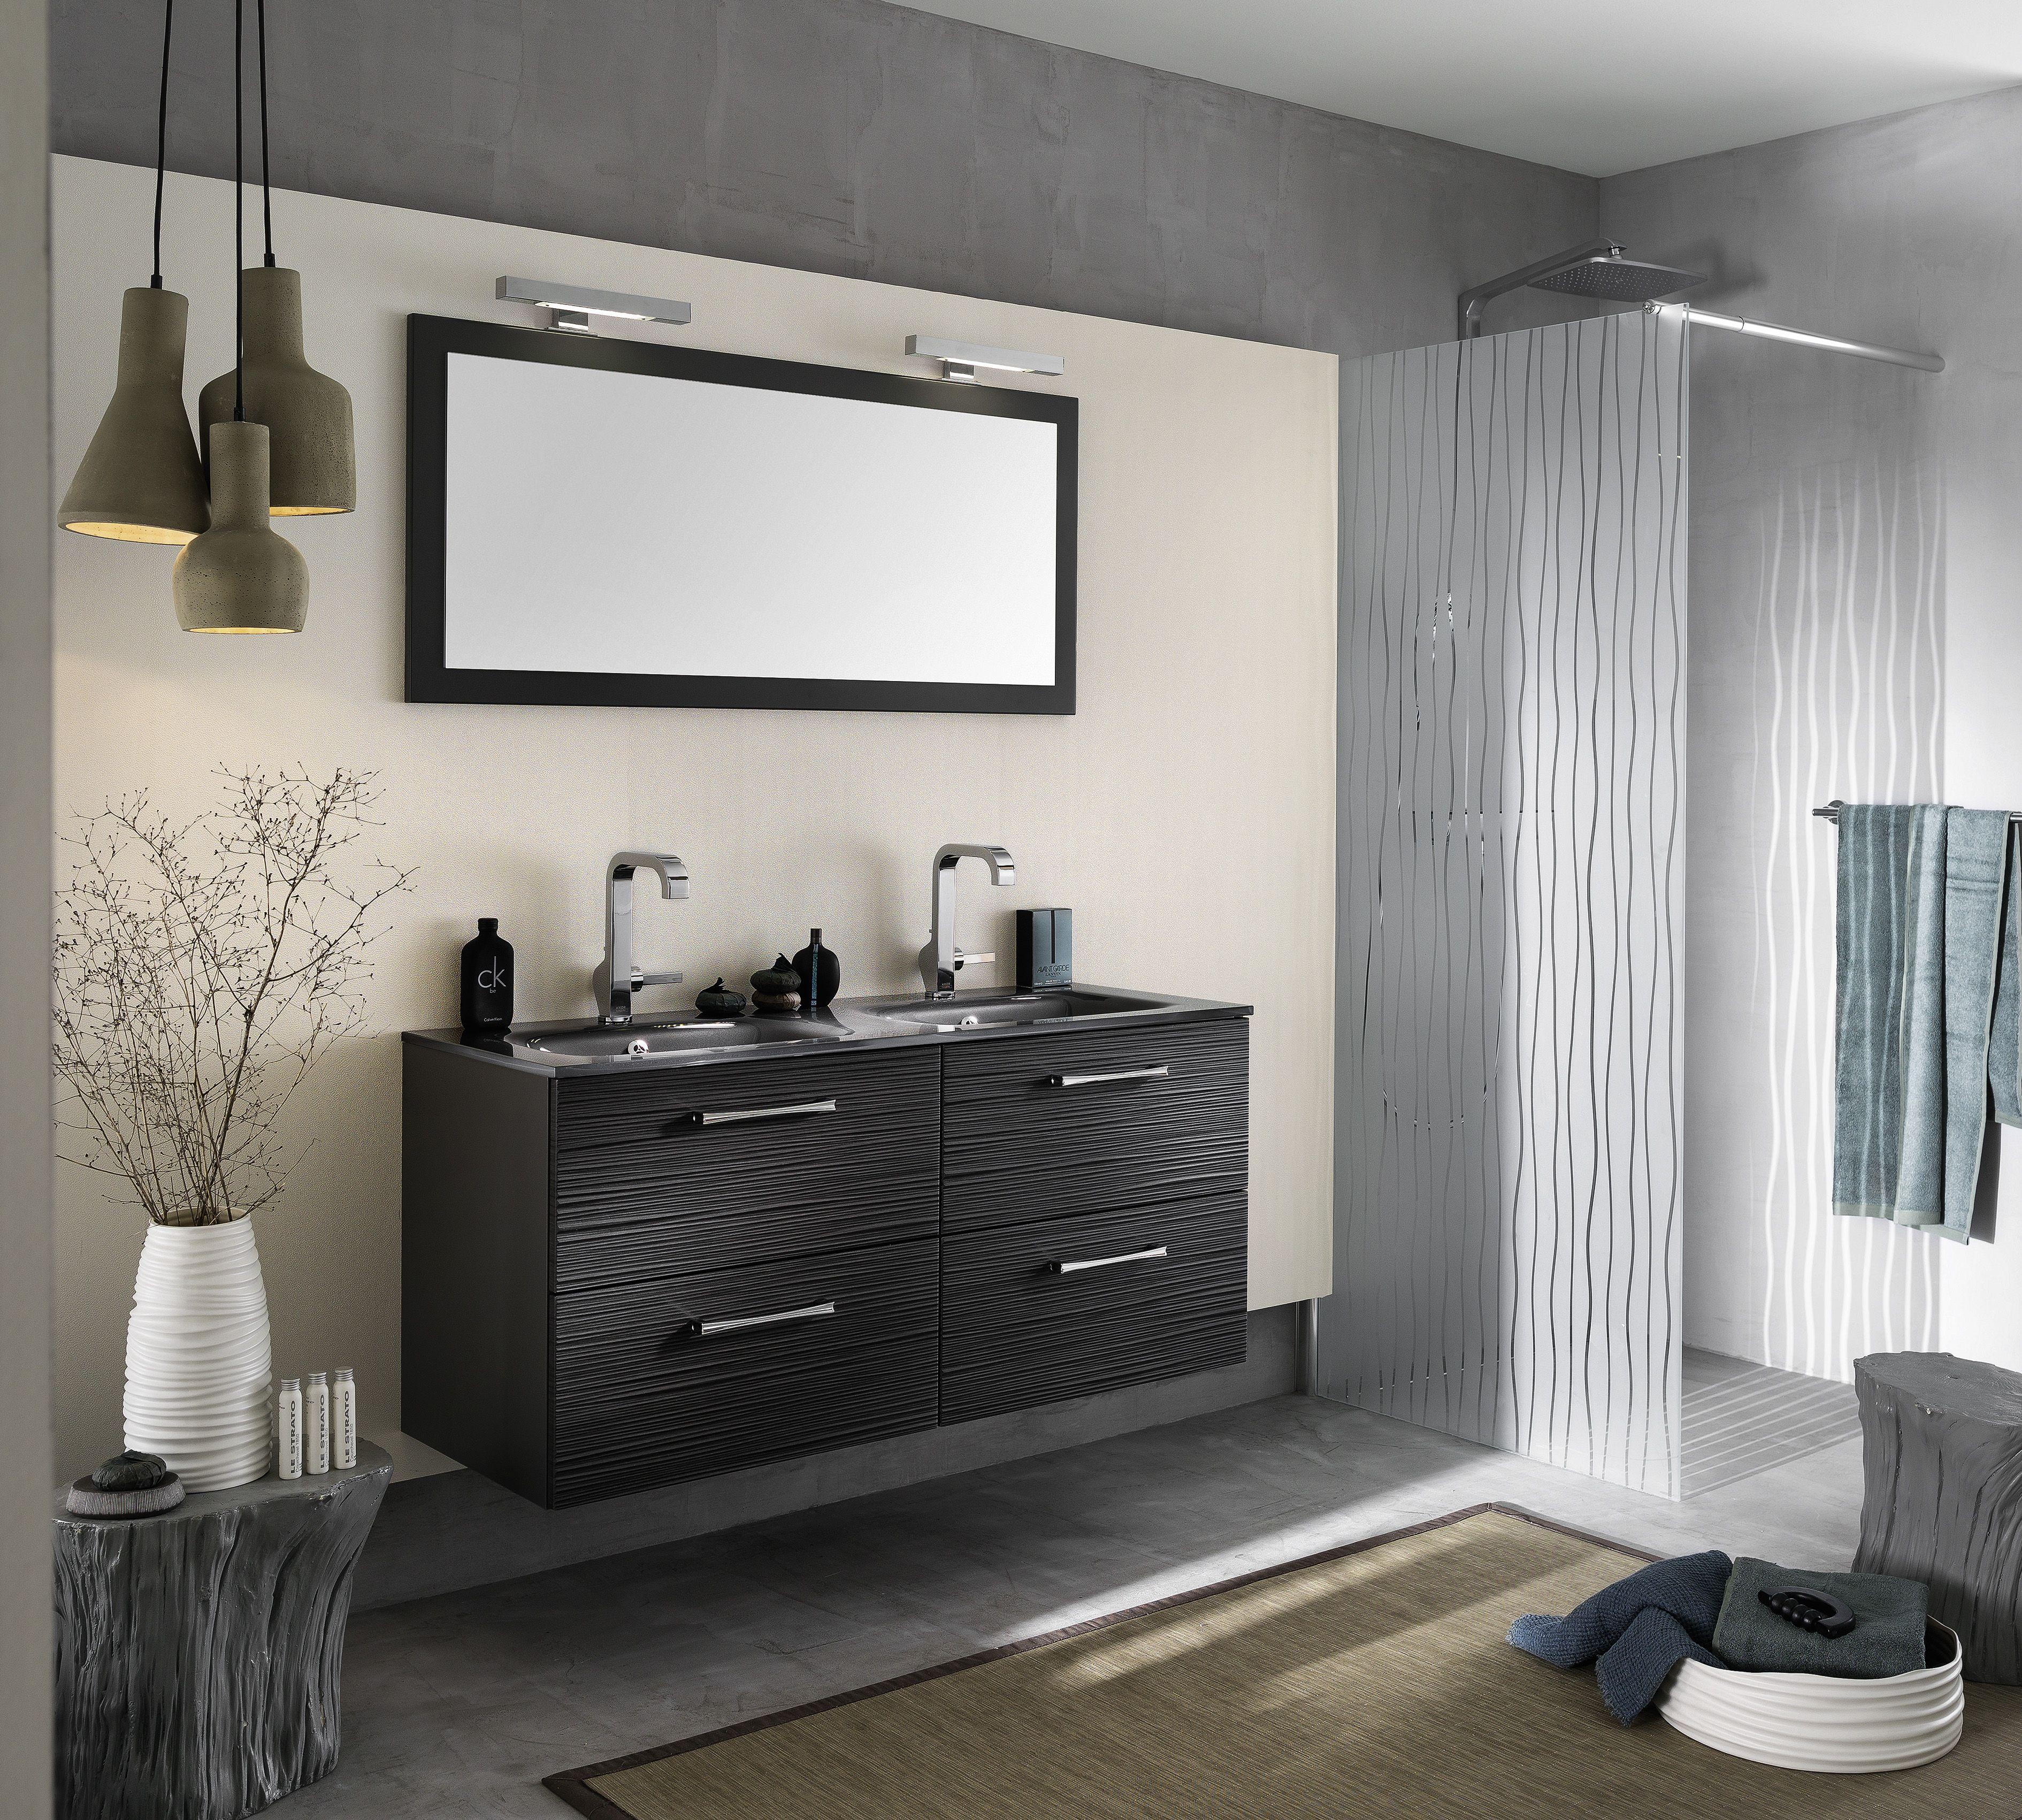 pin by techno conseil bain douche on meuble salle de bain pinterest